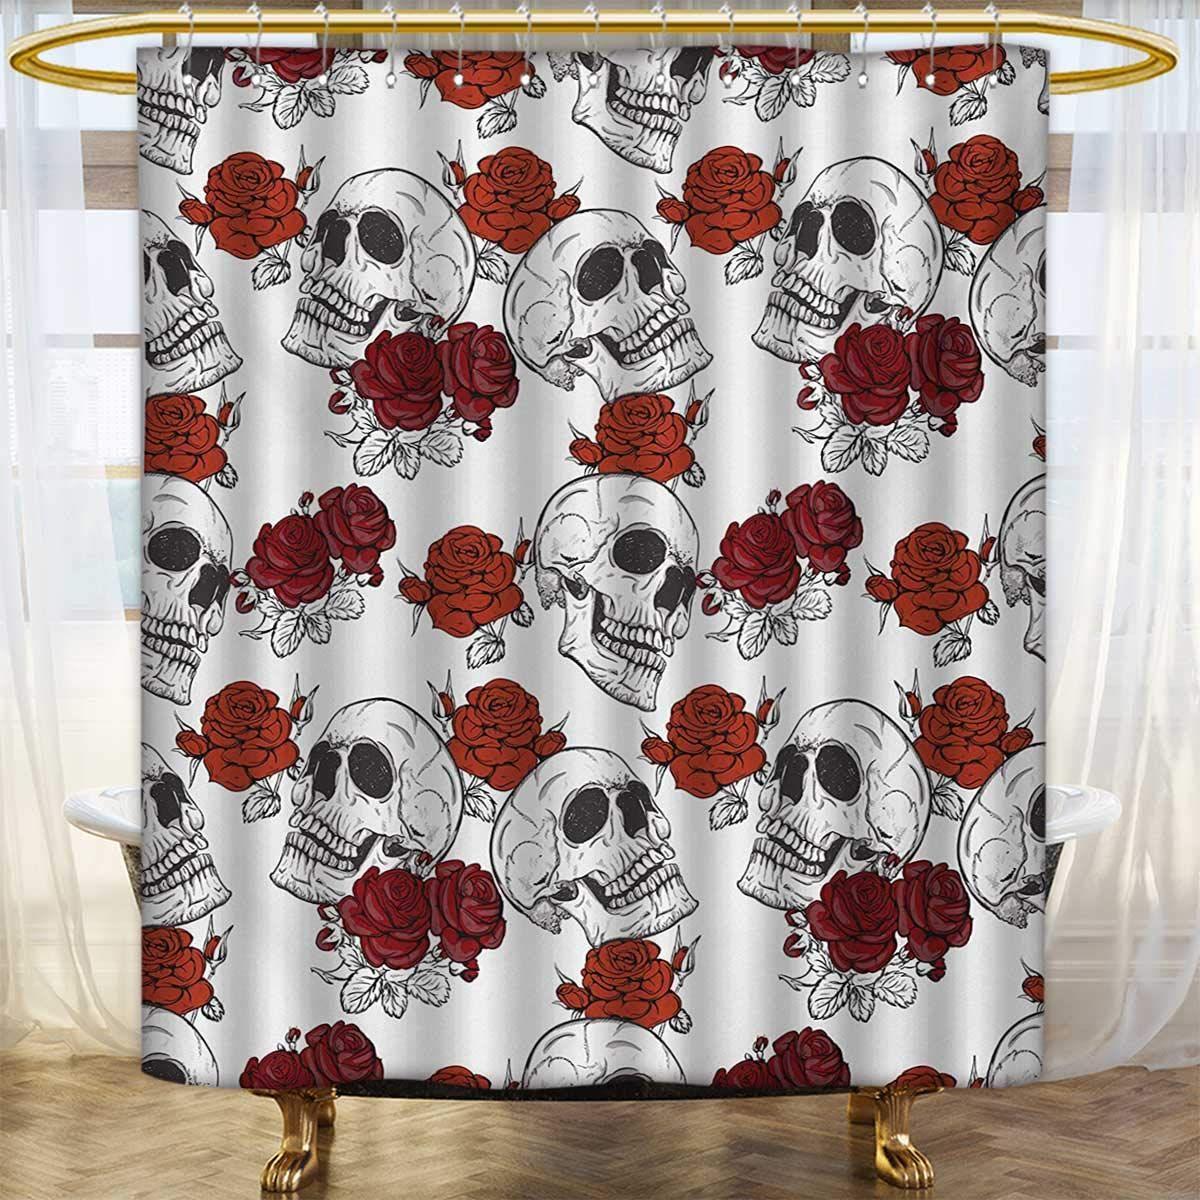 Lacencn Skullshower Curtains Mildew Resistantretro Gothic Dead